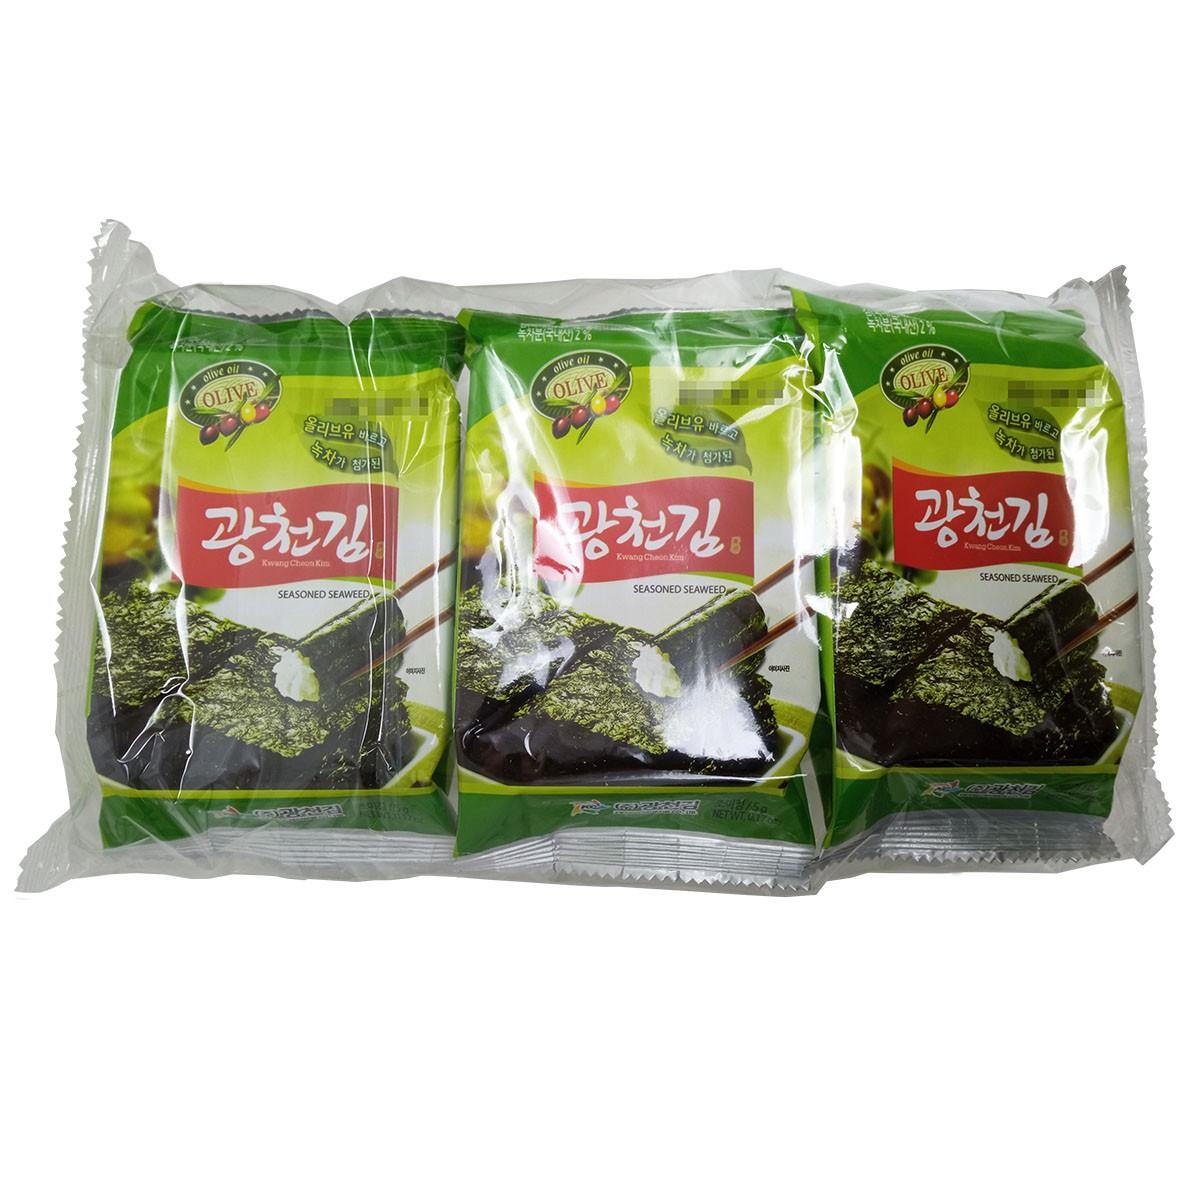 Alga Temperada com Chá Verde e Oliva 15g(5gx3) - Kwang Cheon Kim